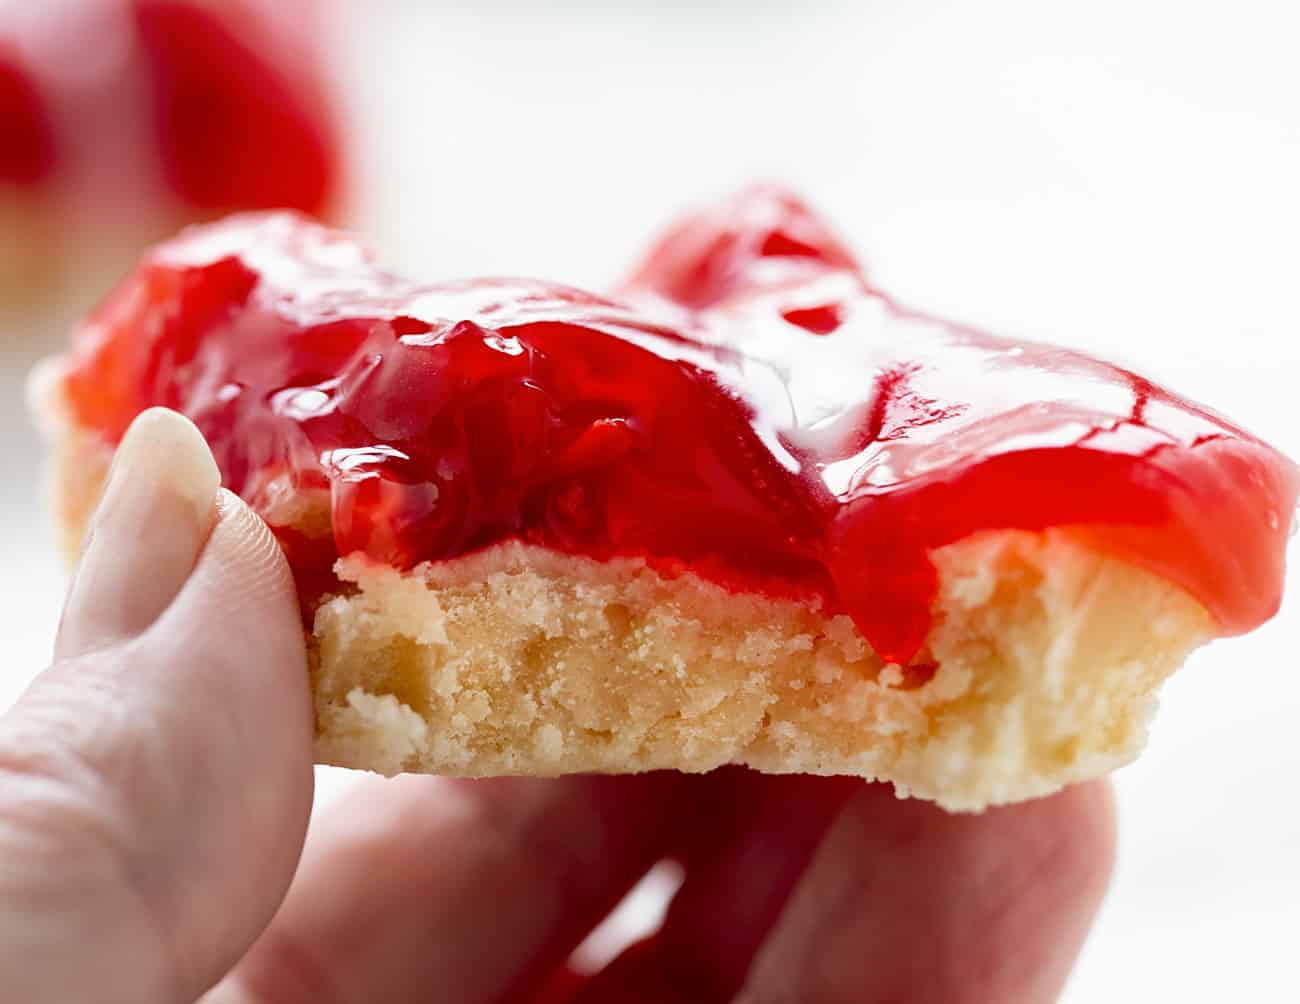 Bite into Cherry Bars